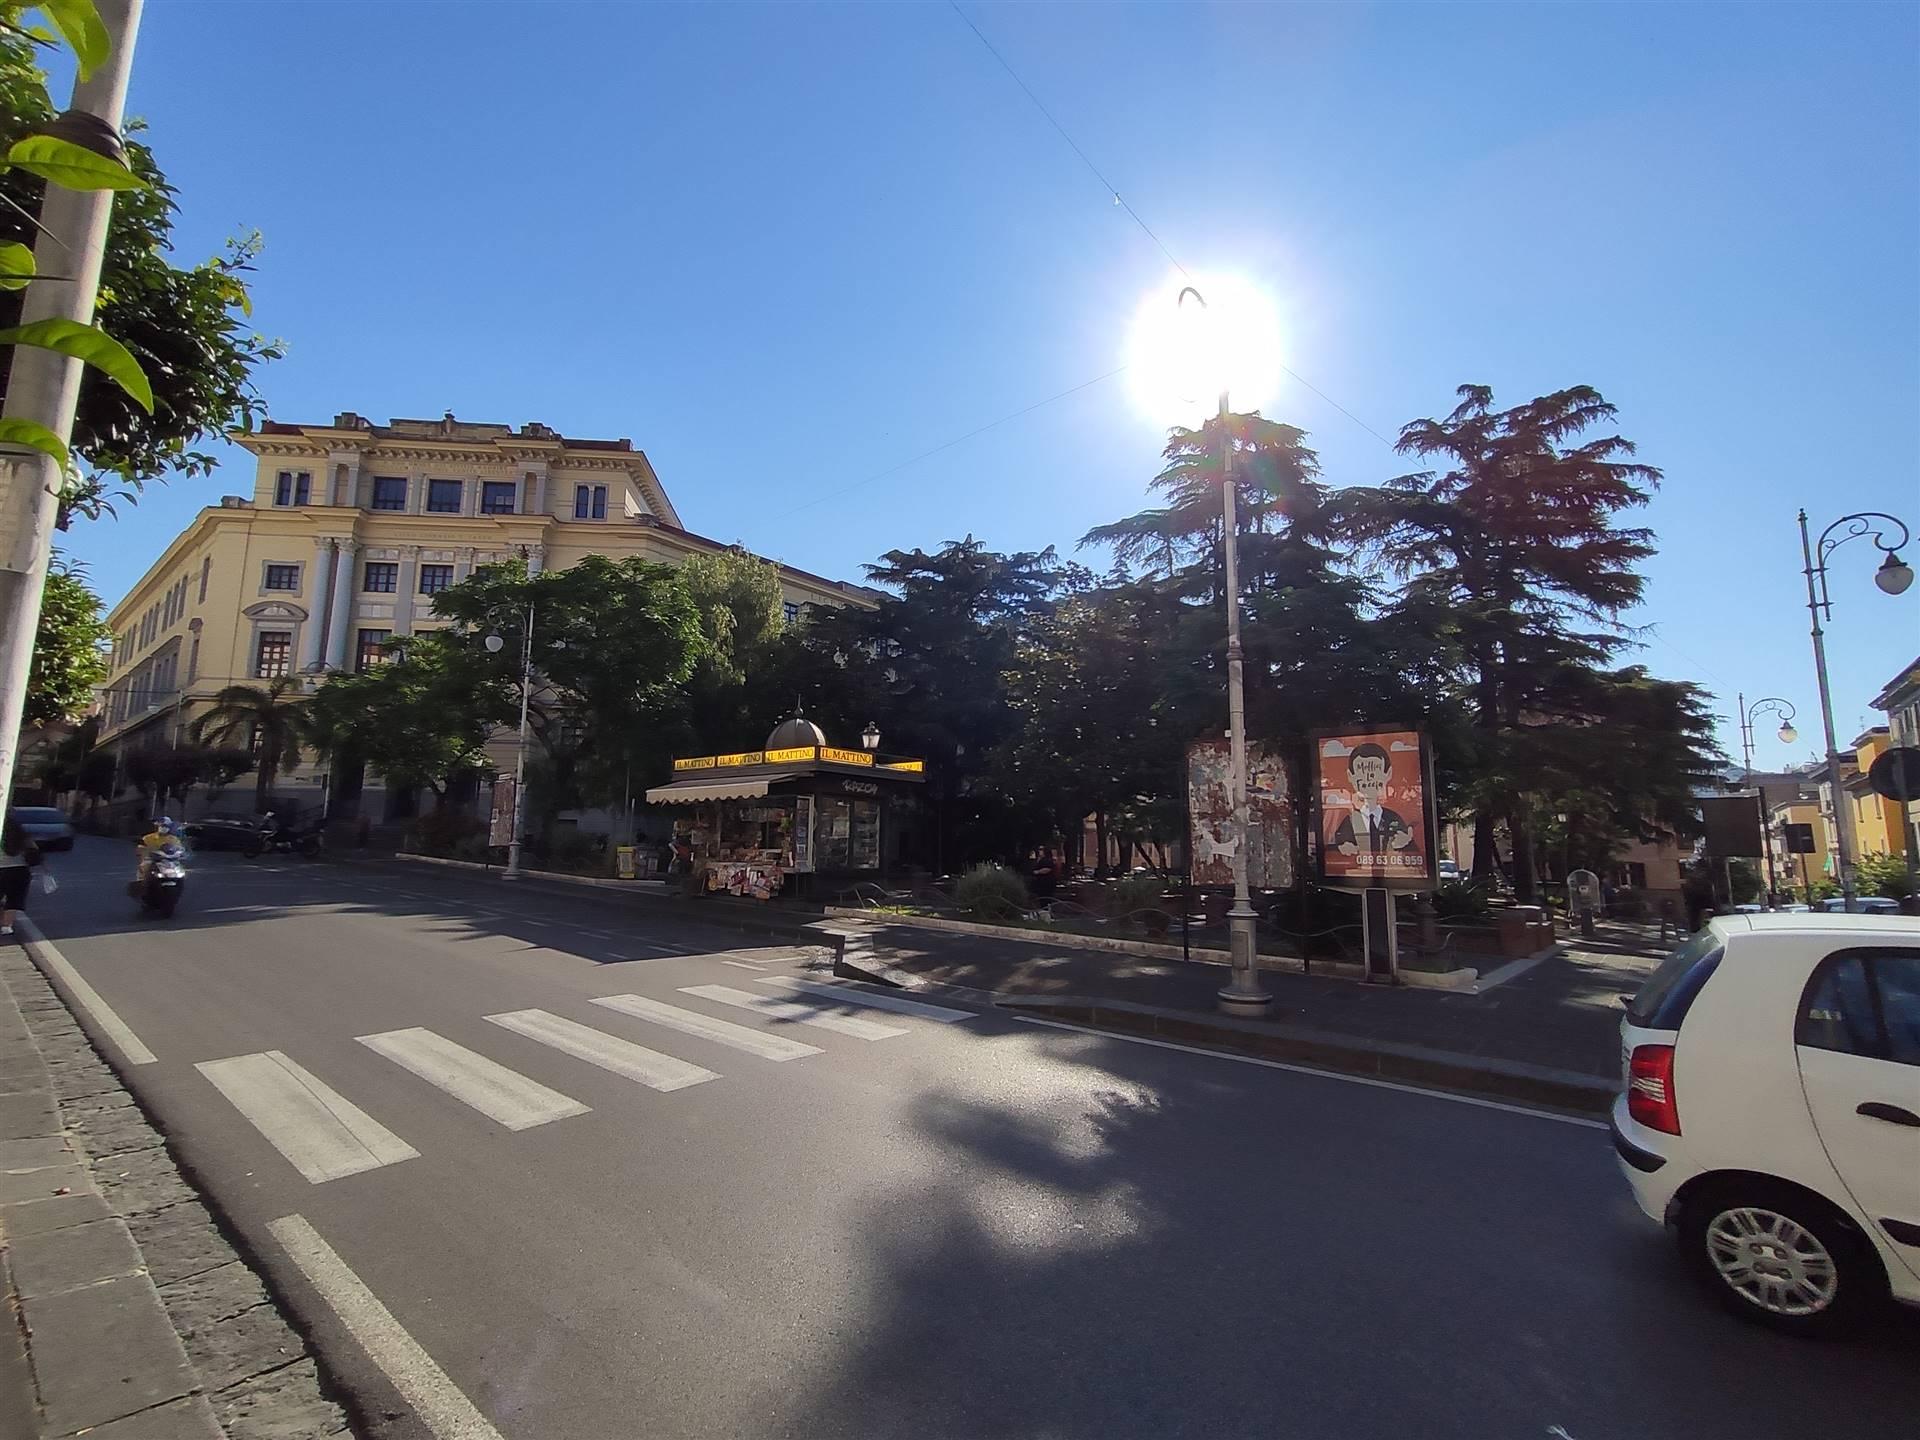 Negozio a Salerno